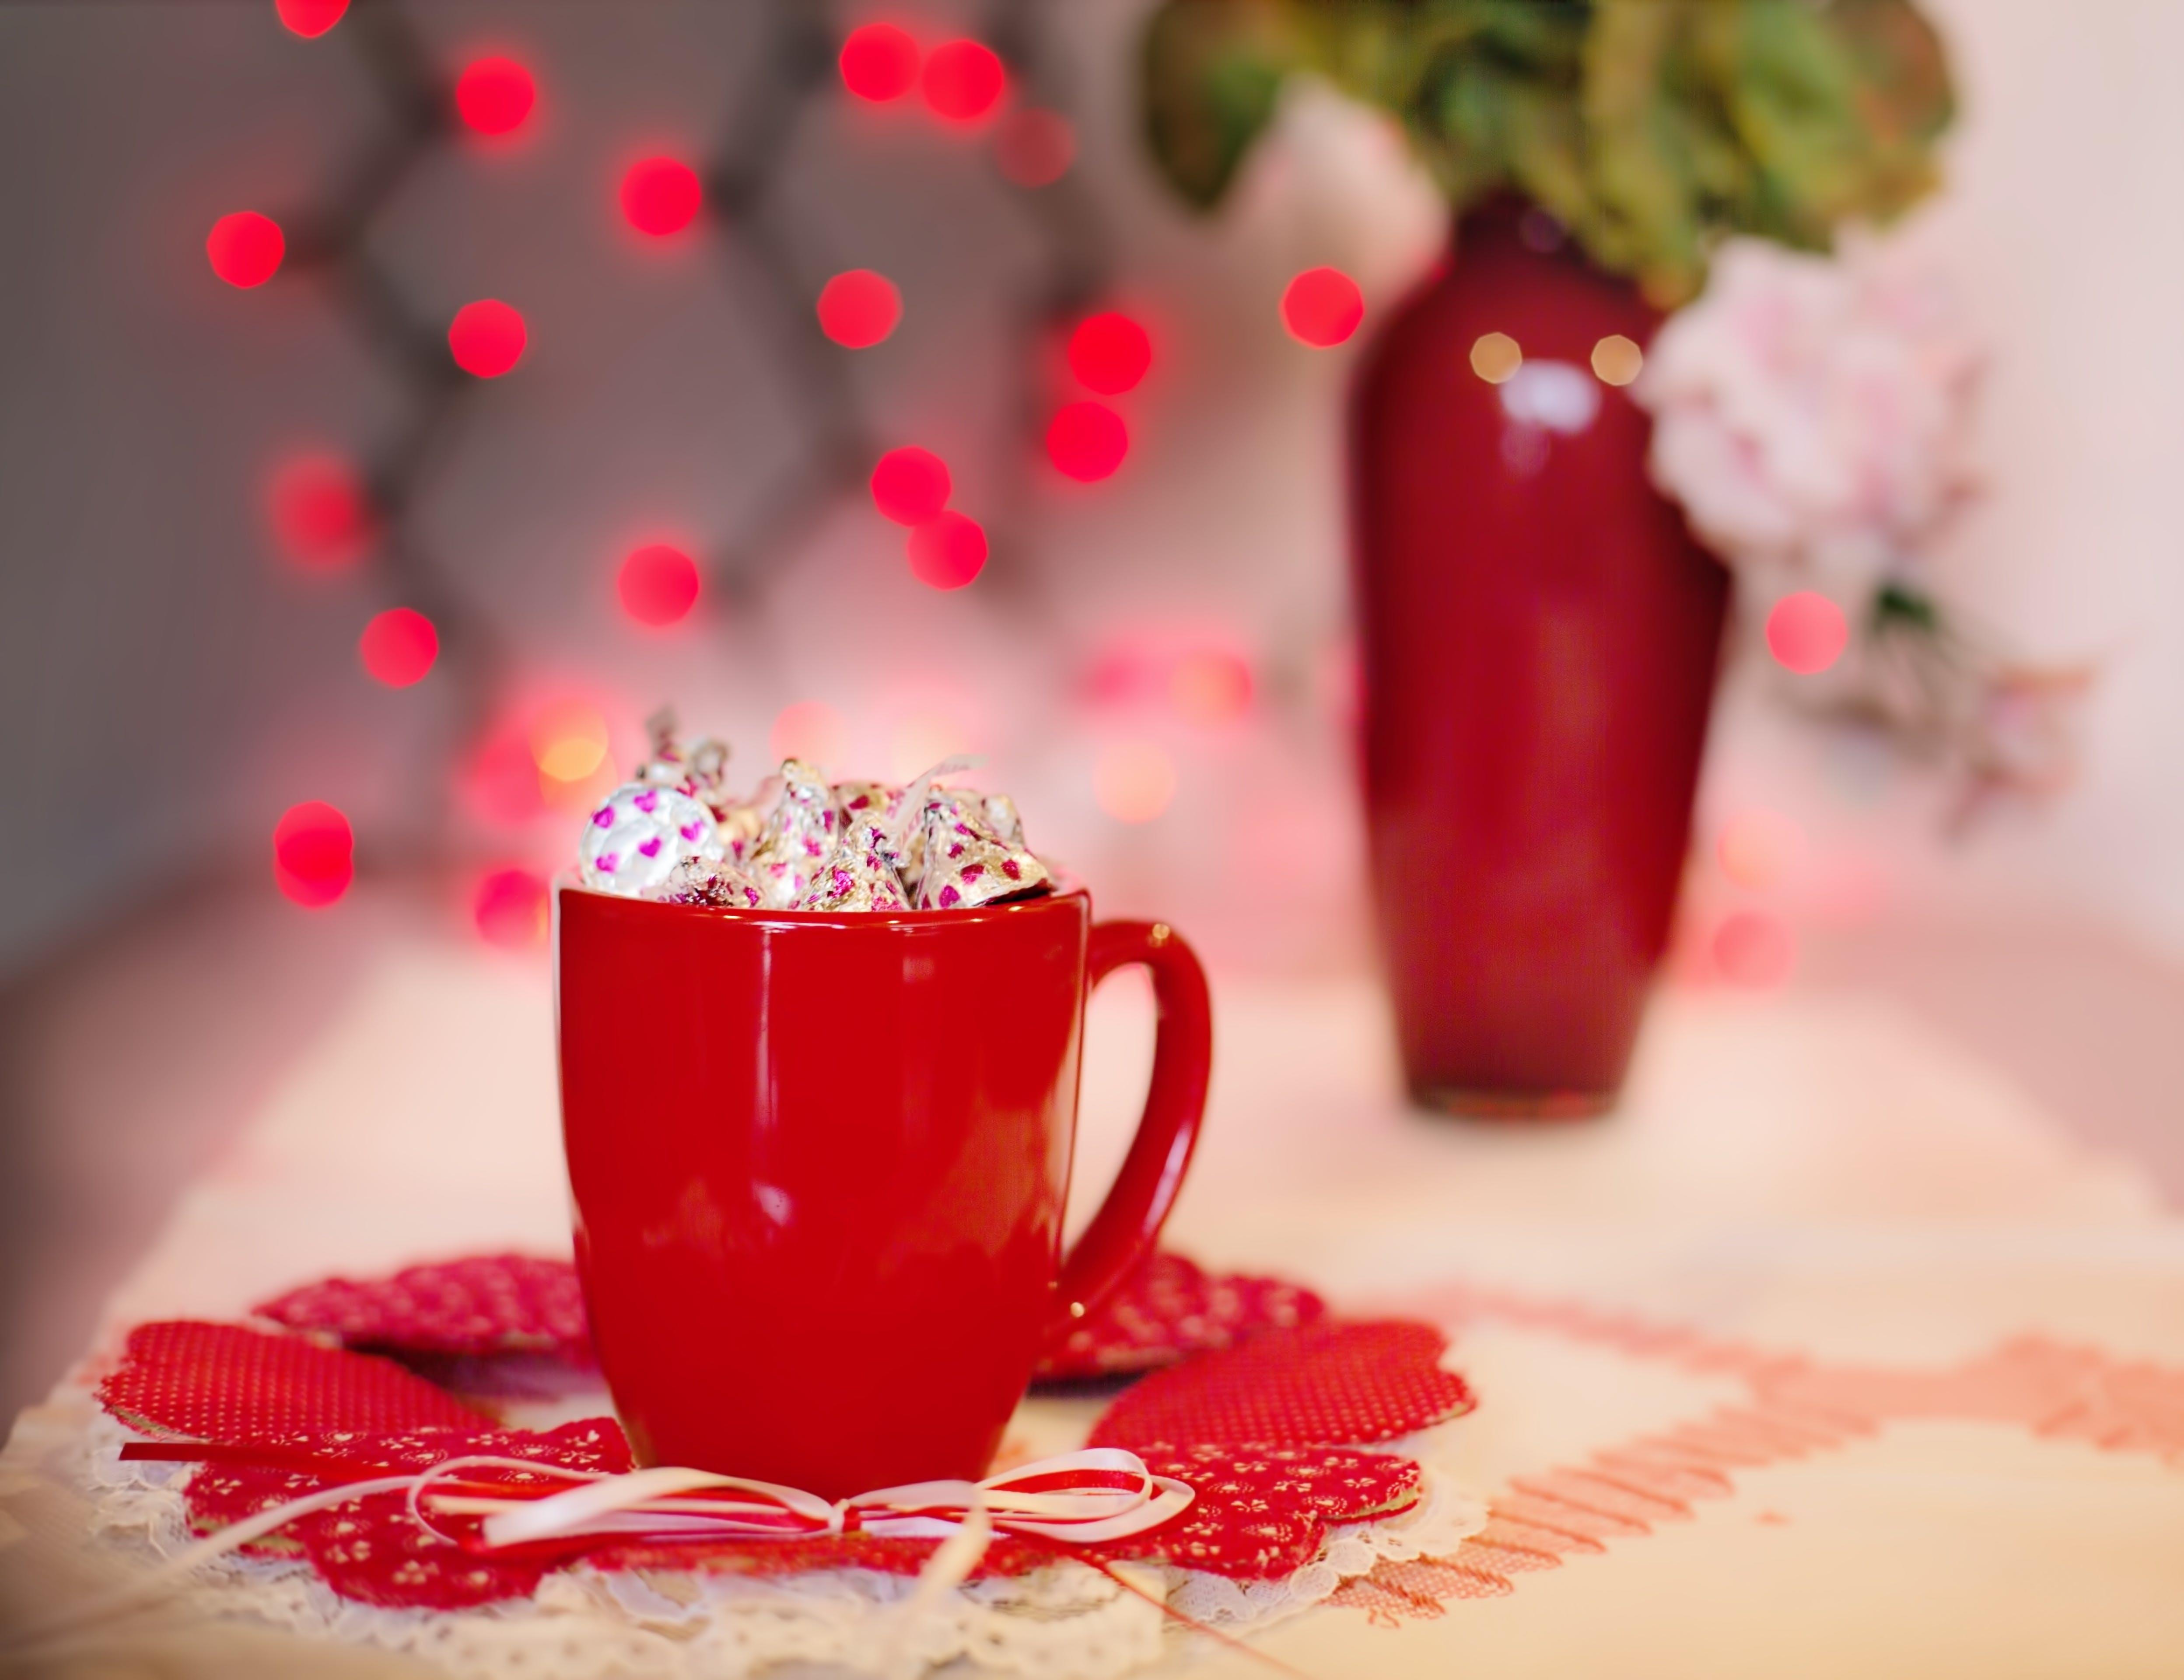 Free stock photo of holiday, red, love, mug